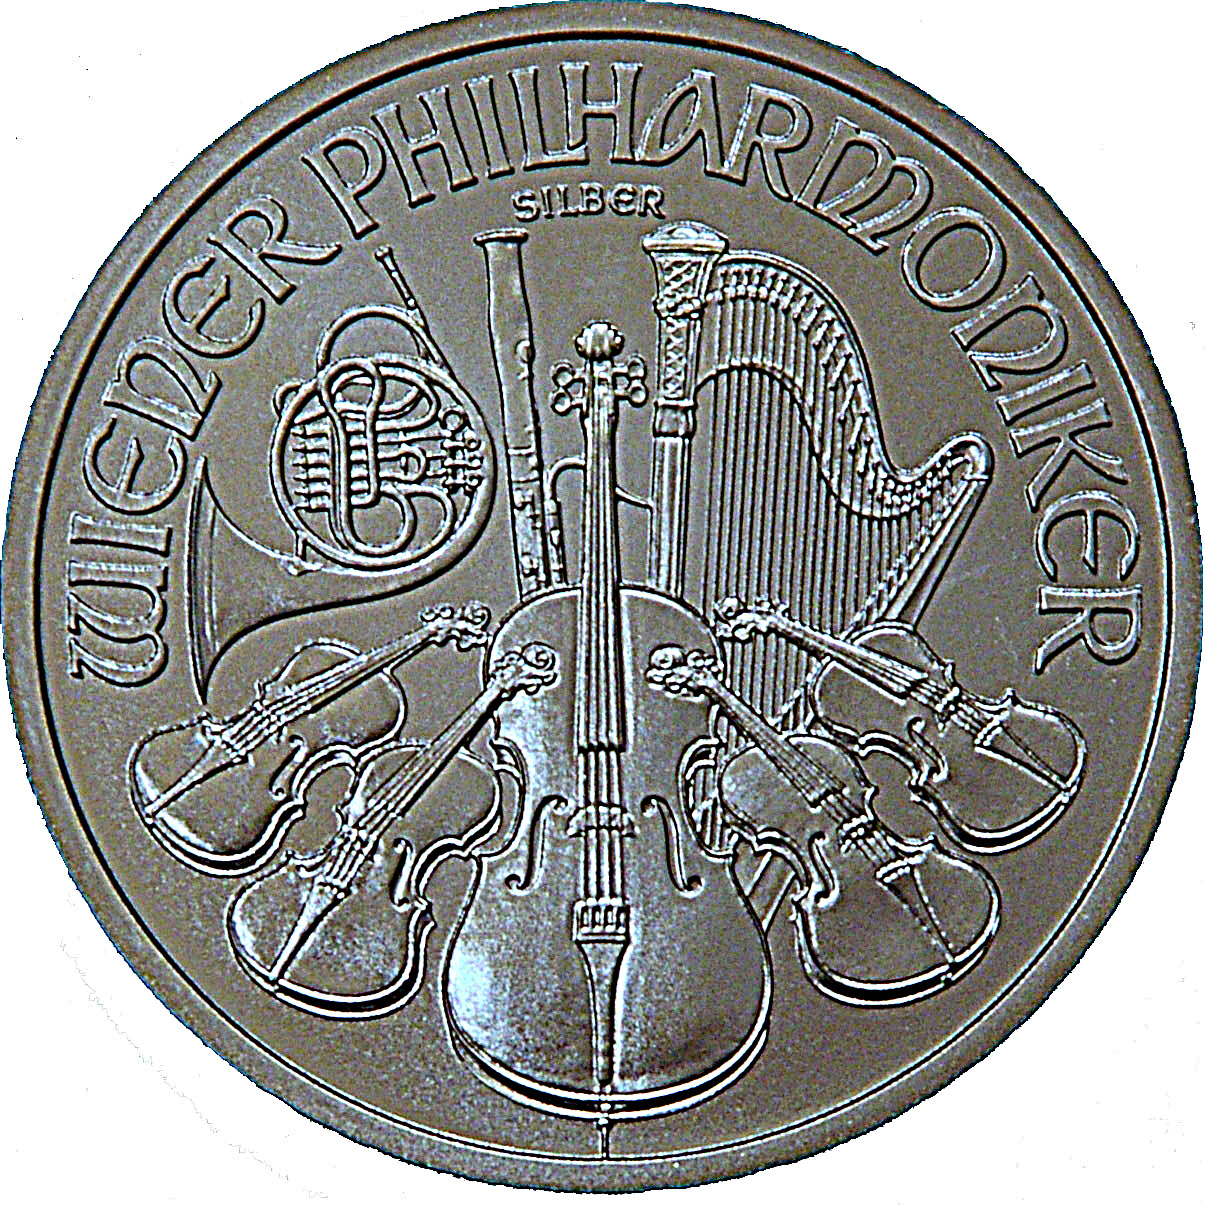 1½ Euro (Vienna Philharmonic) - Austria – Numista